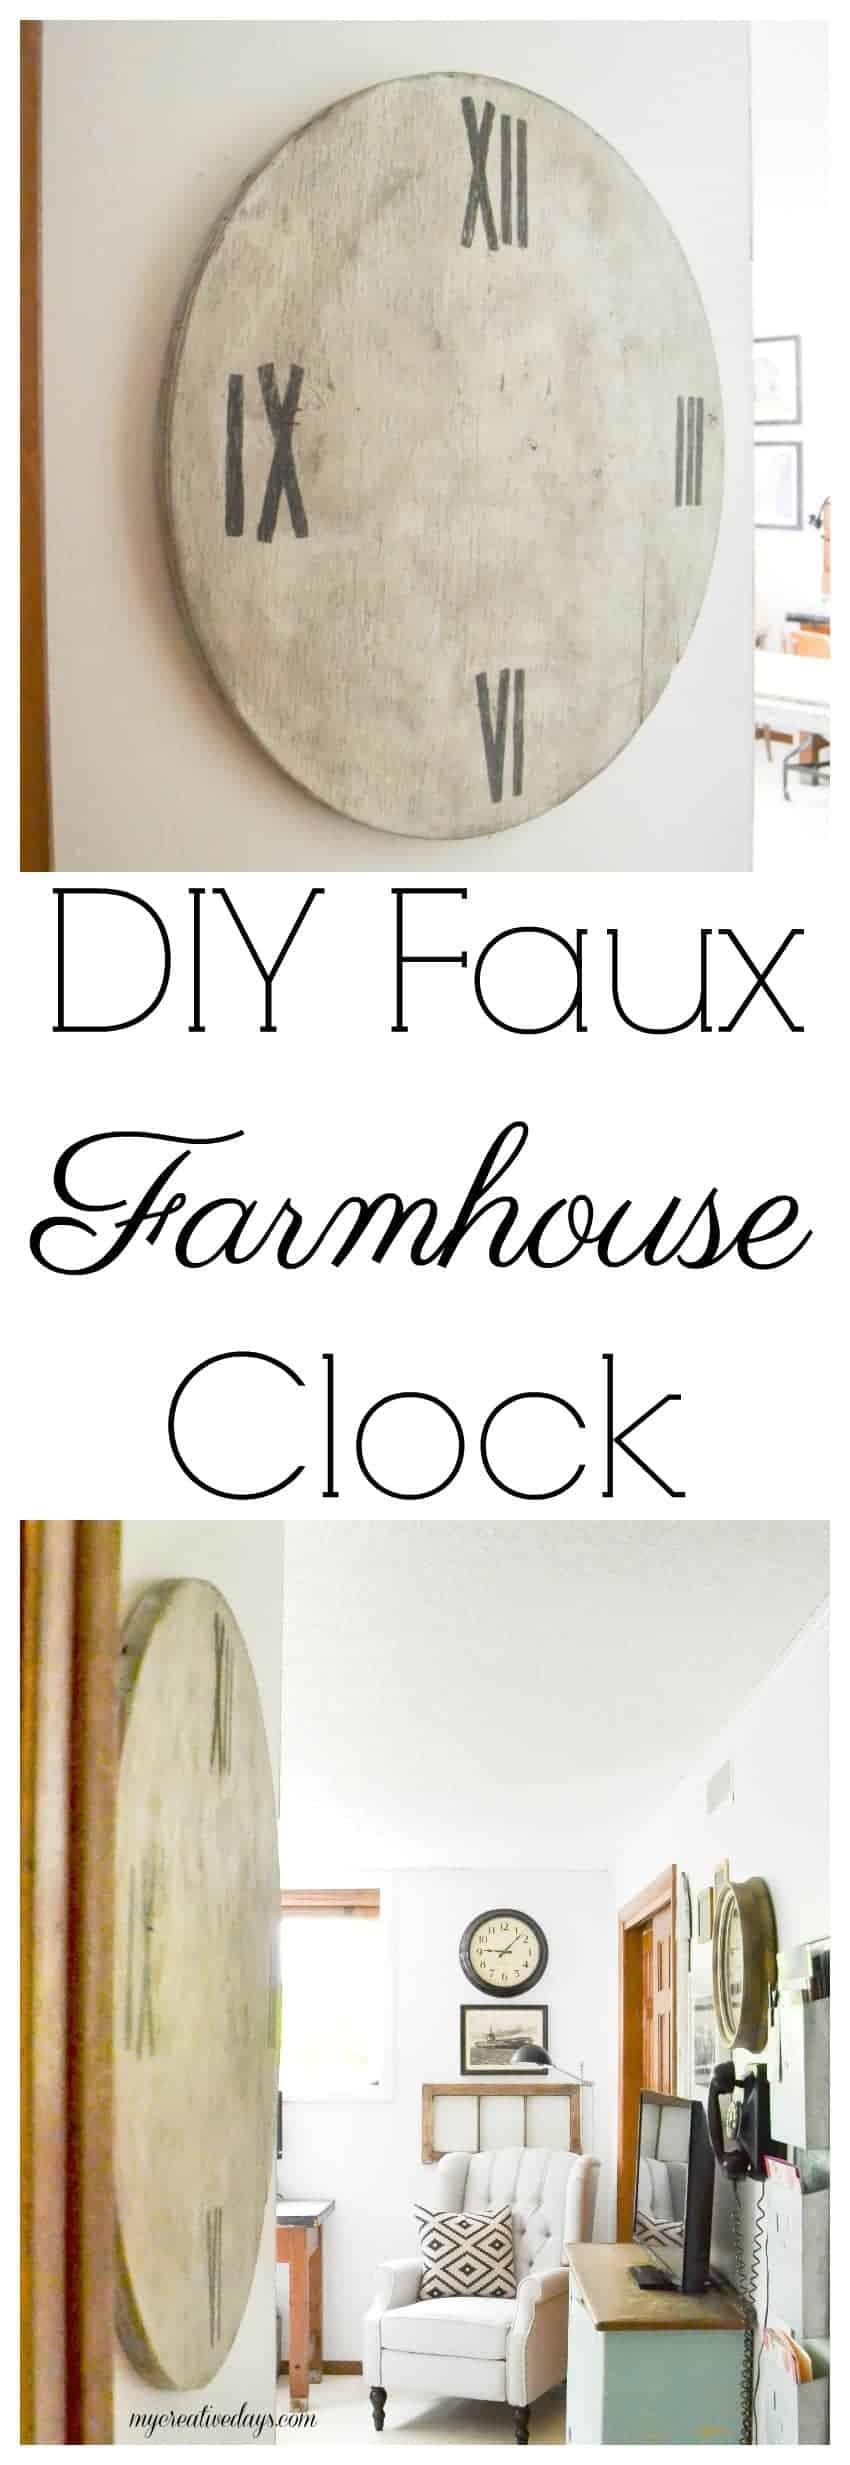 Diy Faux Farmhouse Clock Diy In 30 My Creative Days